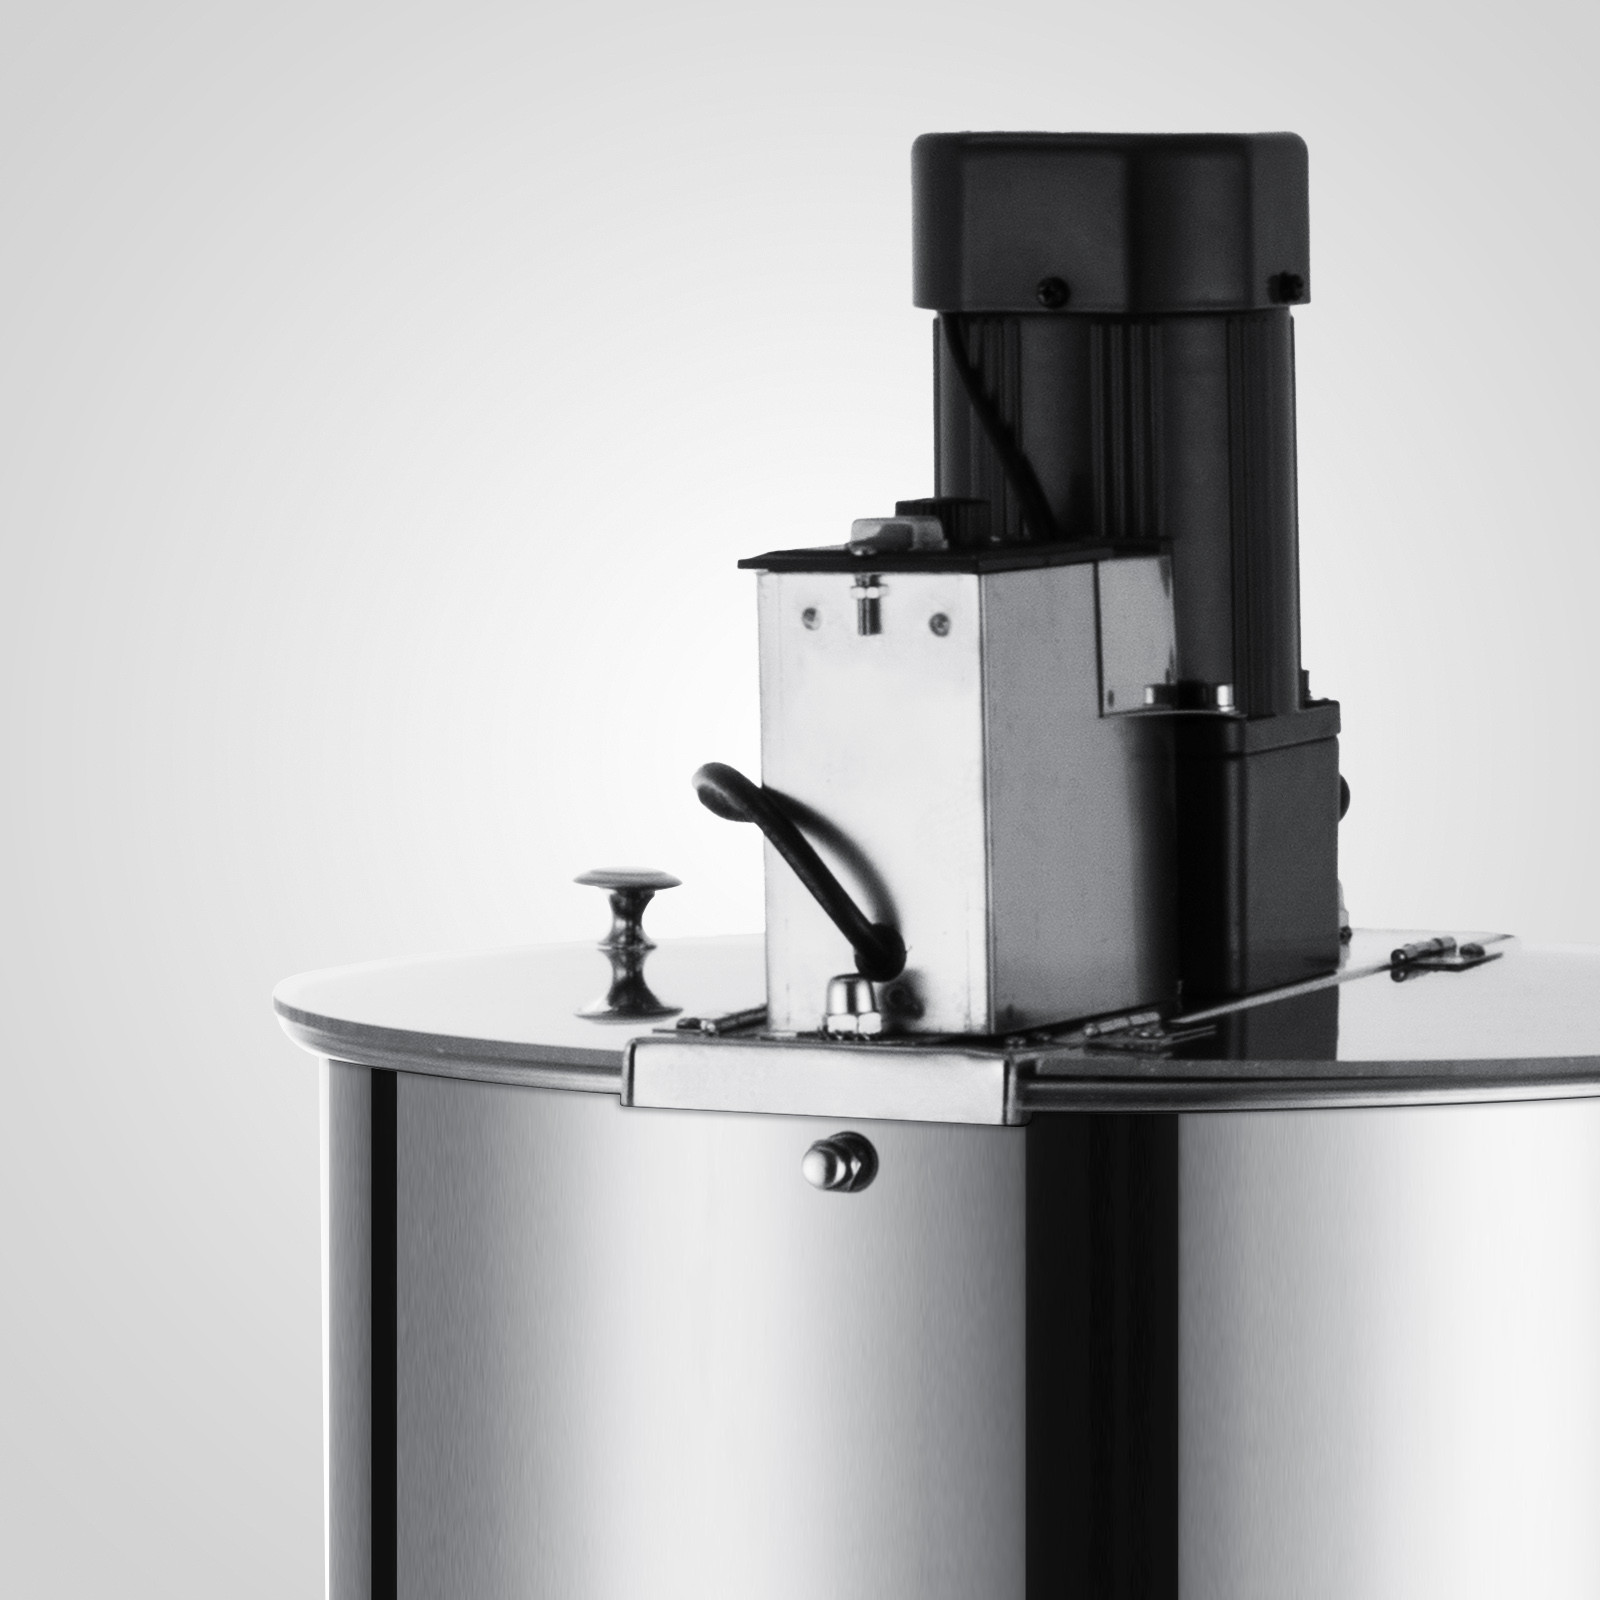 Extracteur-de-Miel-Electrique-manuelle-2-3-4-Cadres-En-Acier-Inox-Centrifugeuse miniature 36